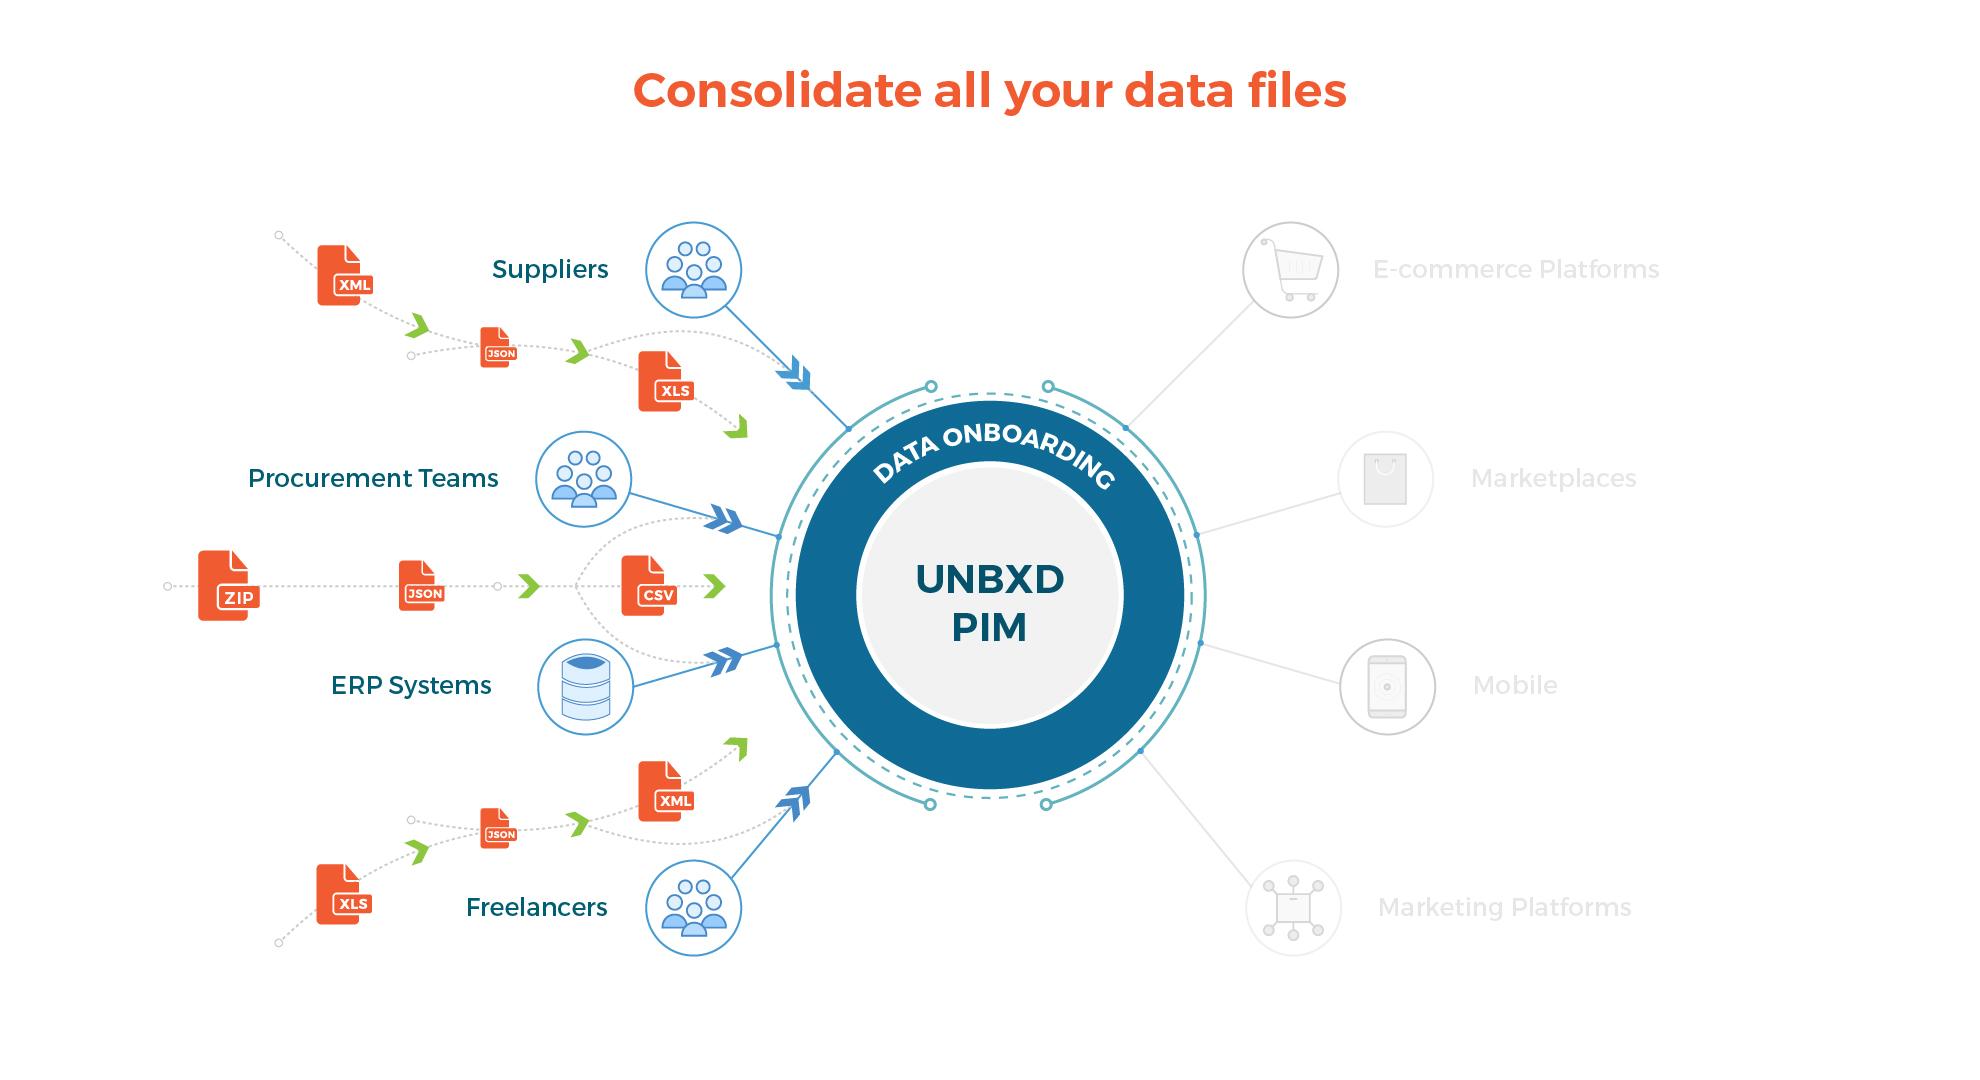 Unbxd PIM solution